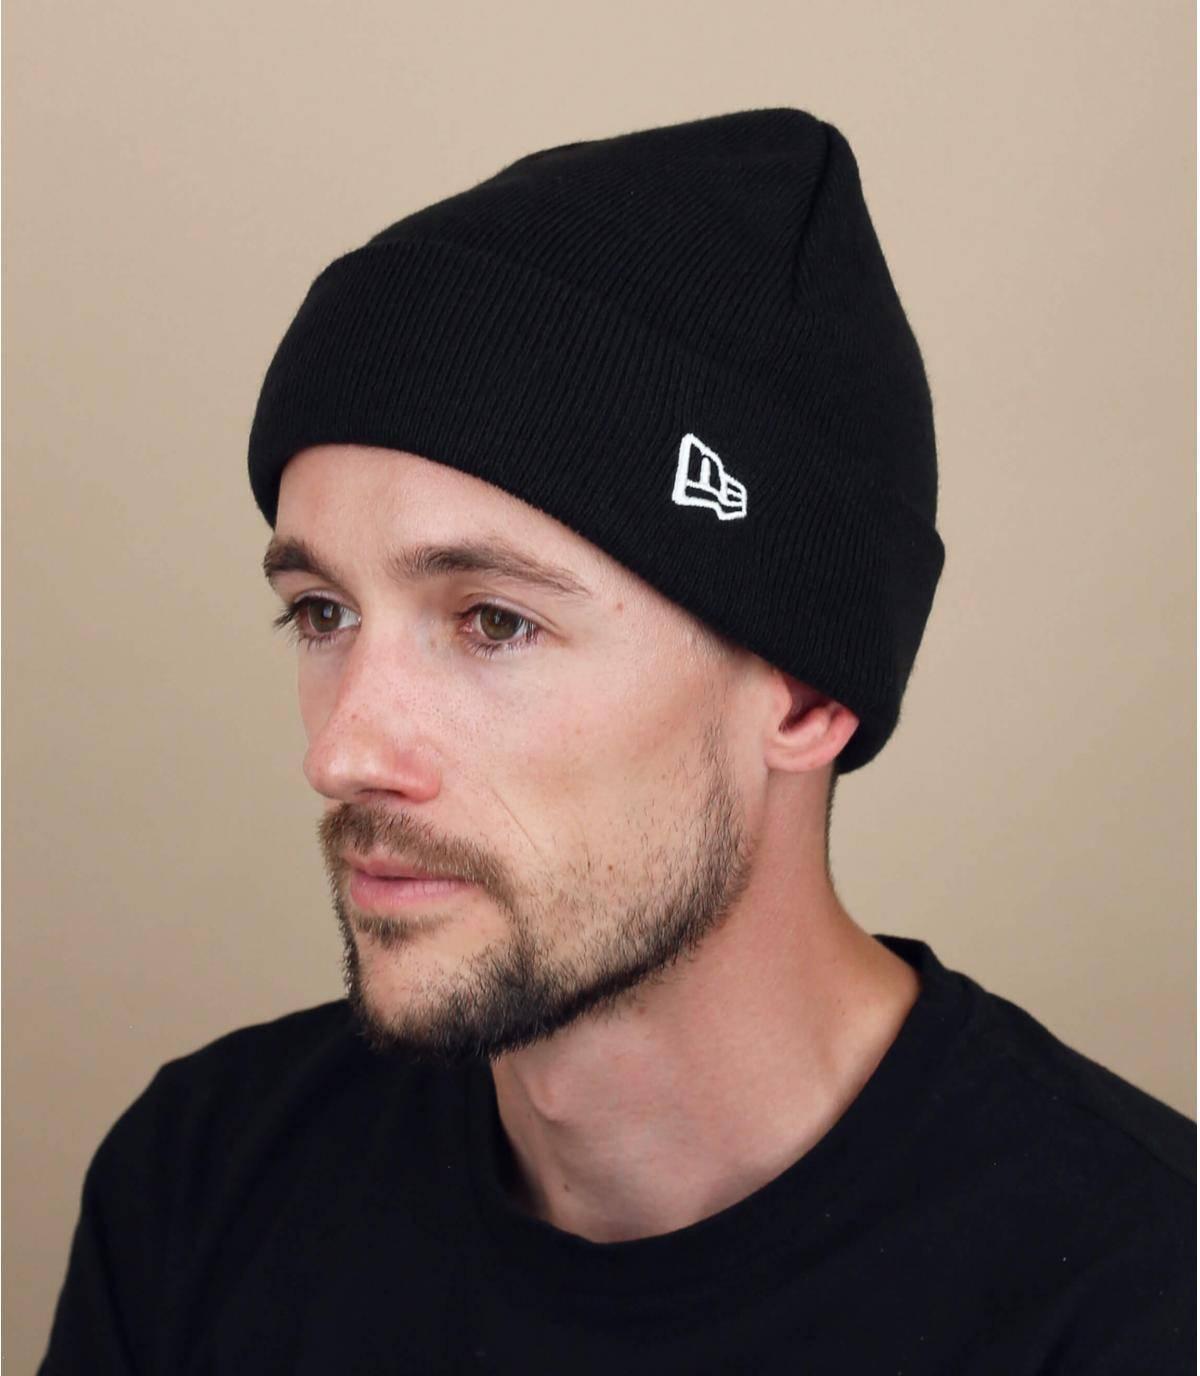 Mütze New Era schwarz